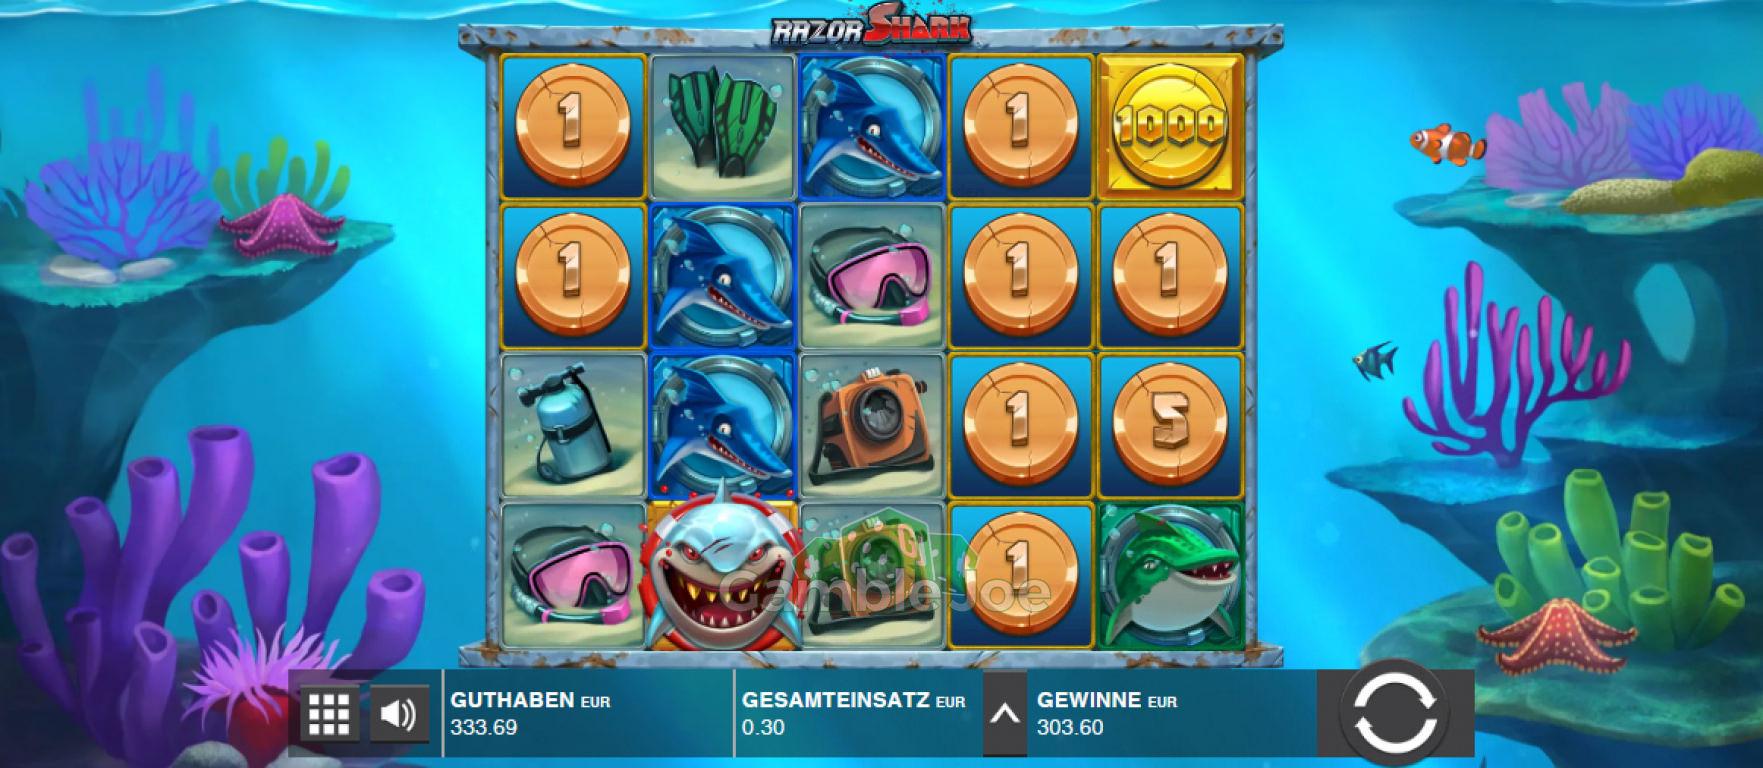 Razor Shark Gewinnbild von myring42